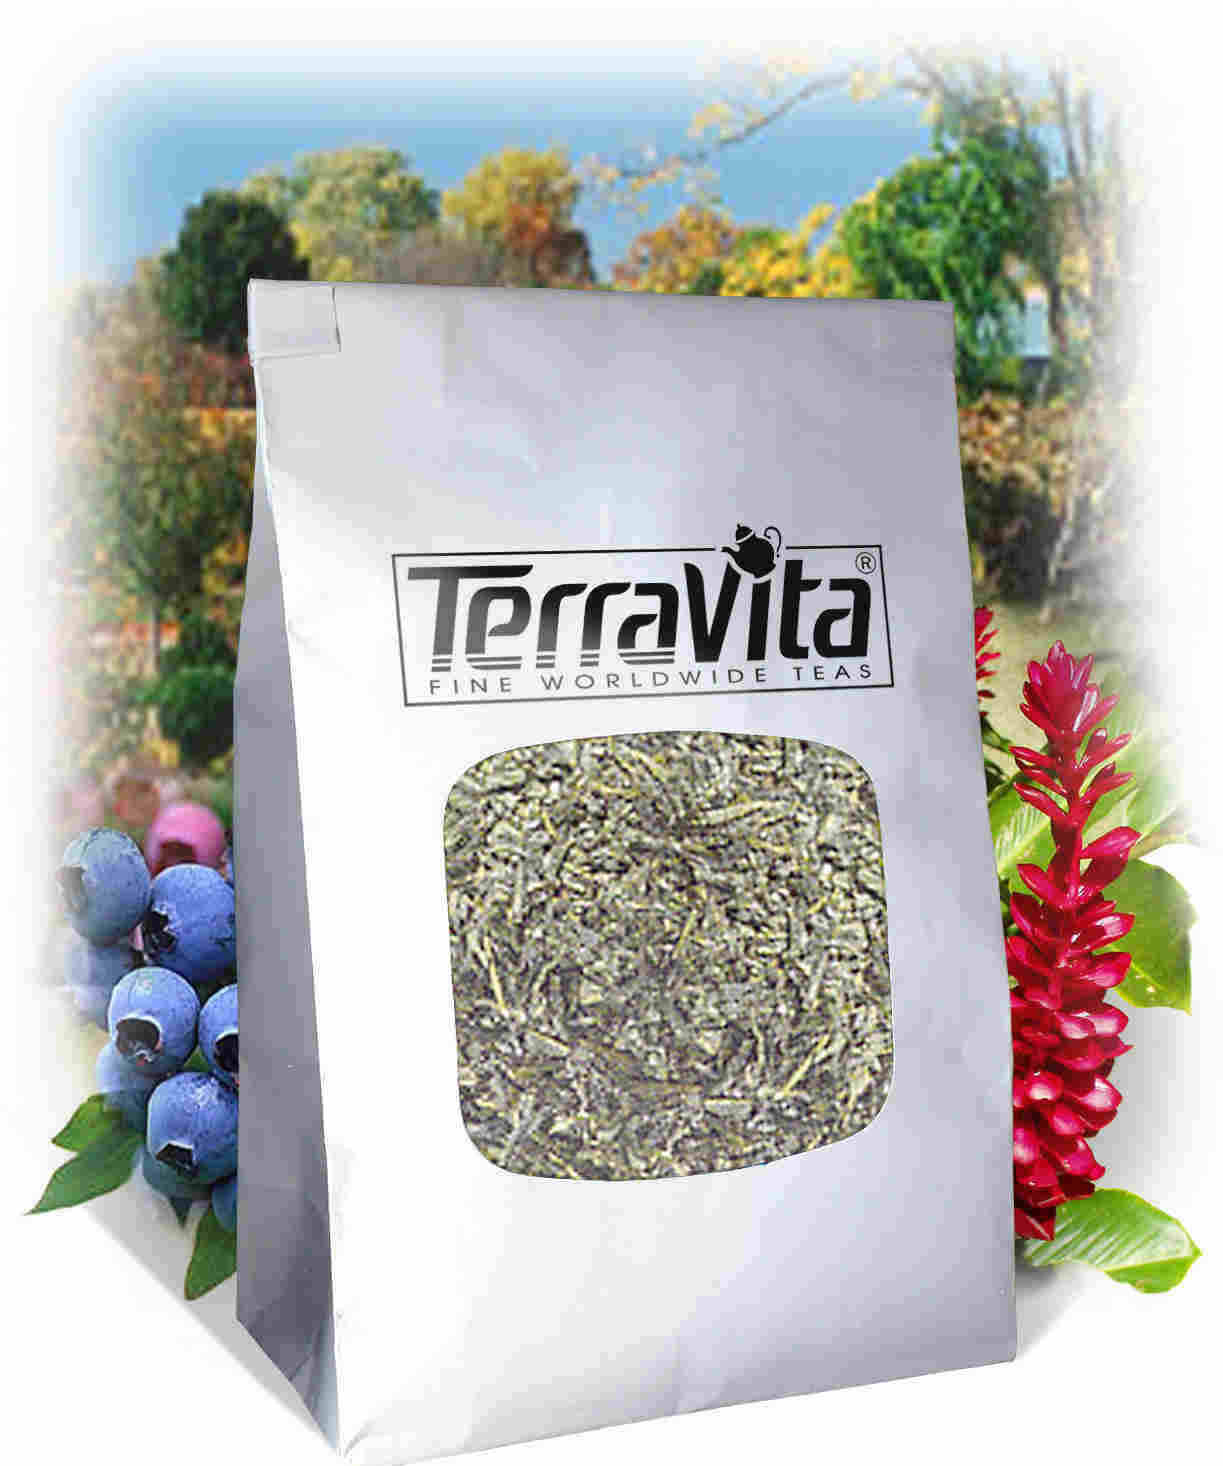 Zedoary Root (Wild Turmeric) Tea (Loose)